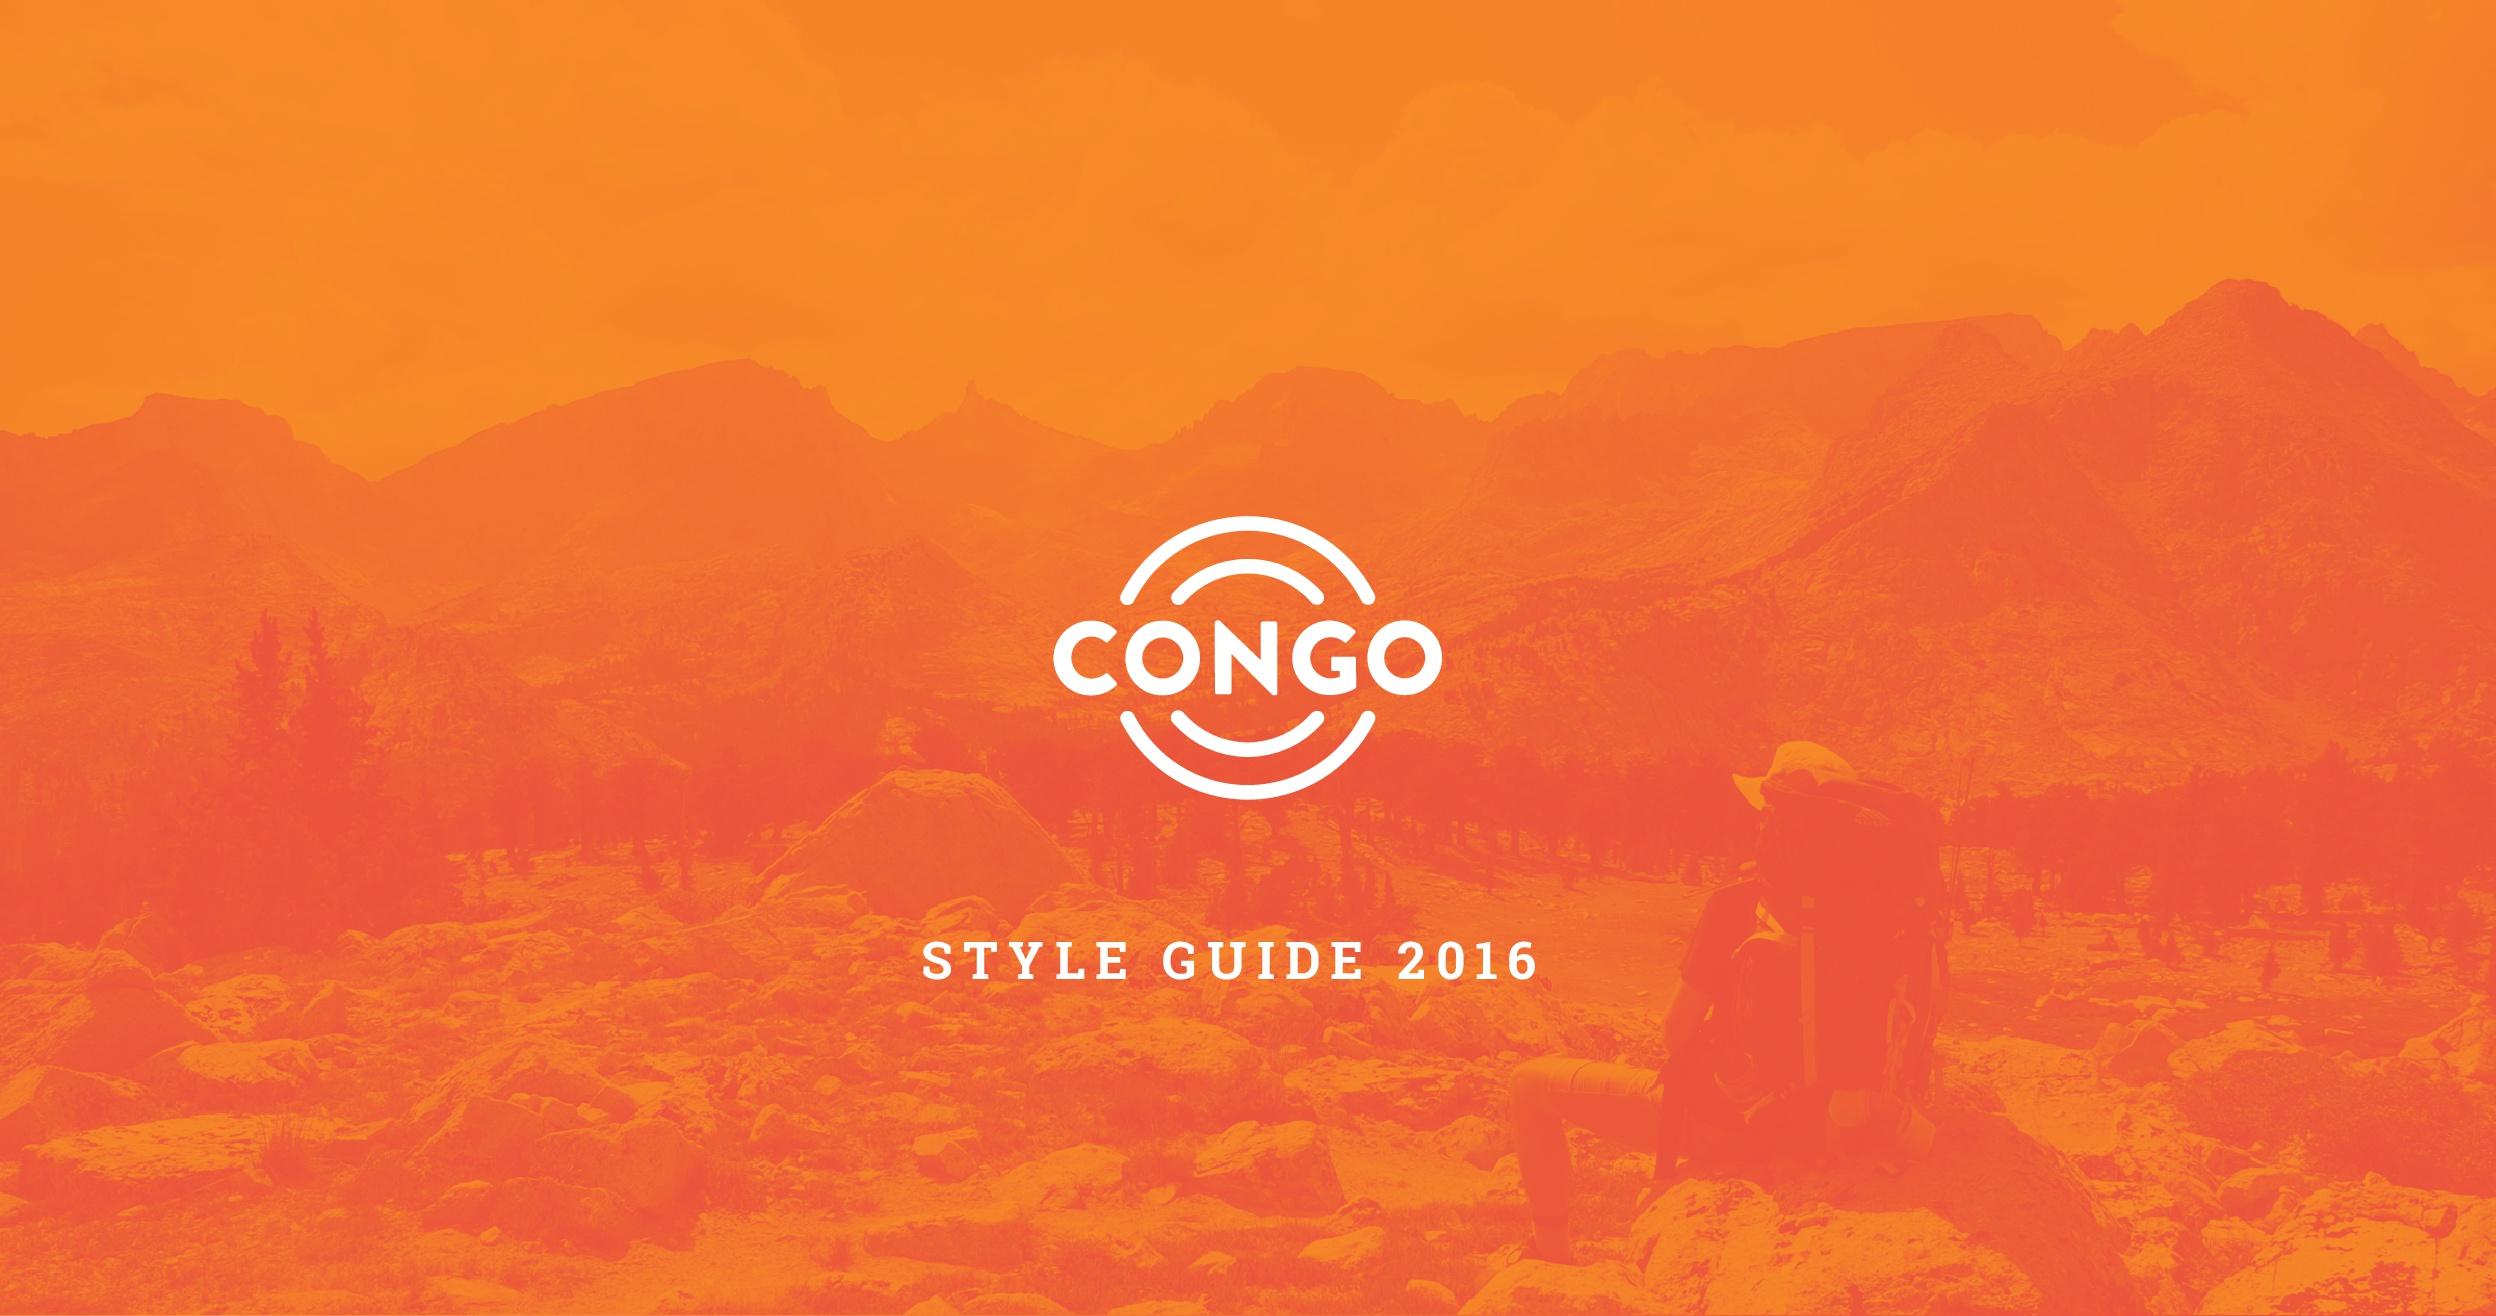 CONGO-Style-Guide-001.jpg